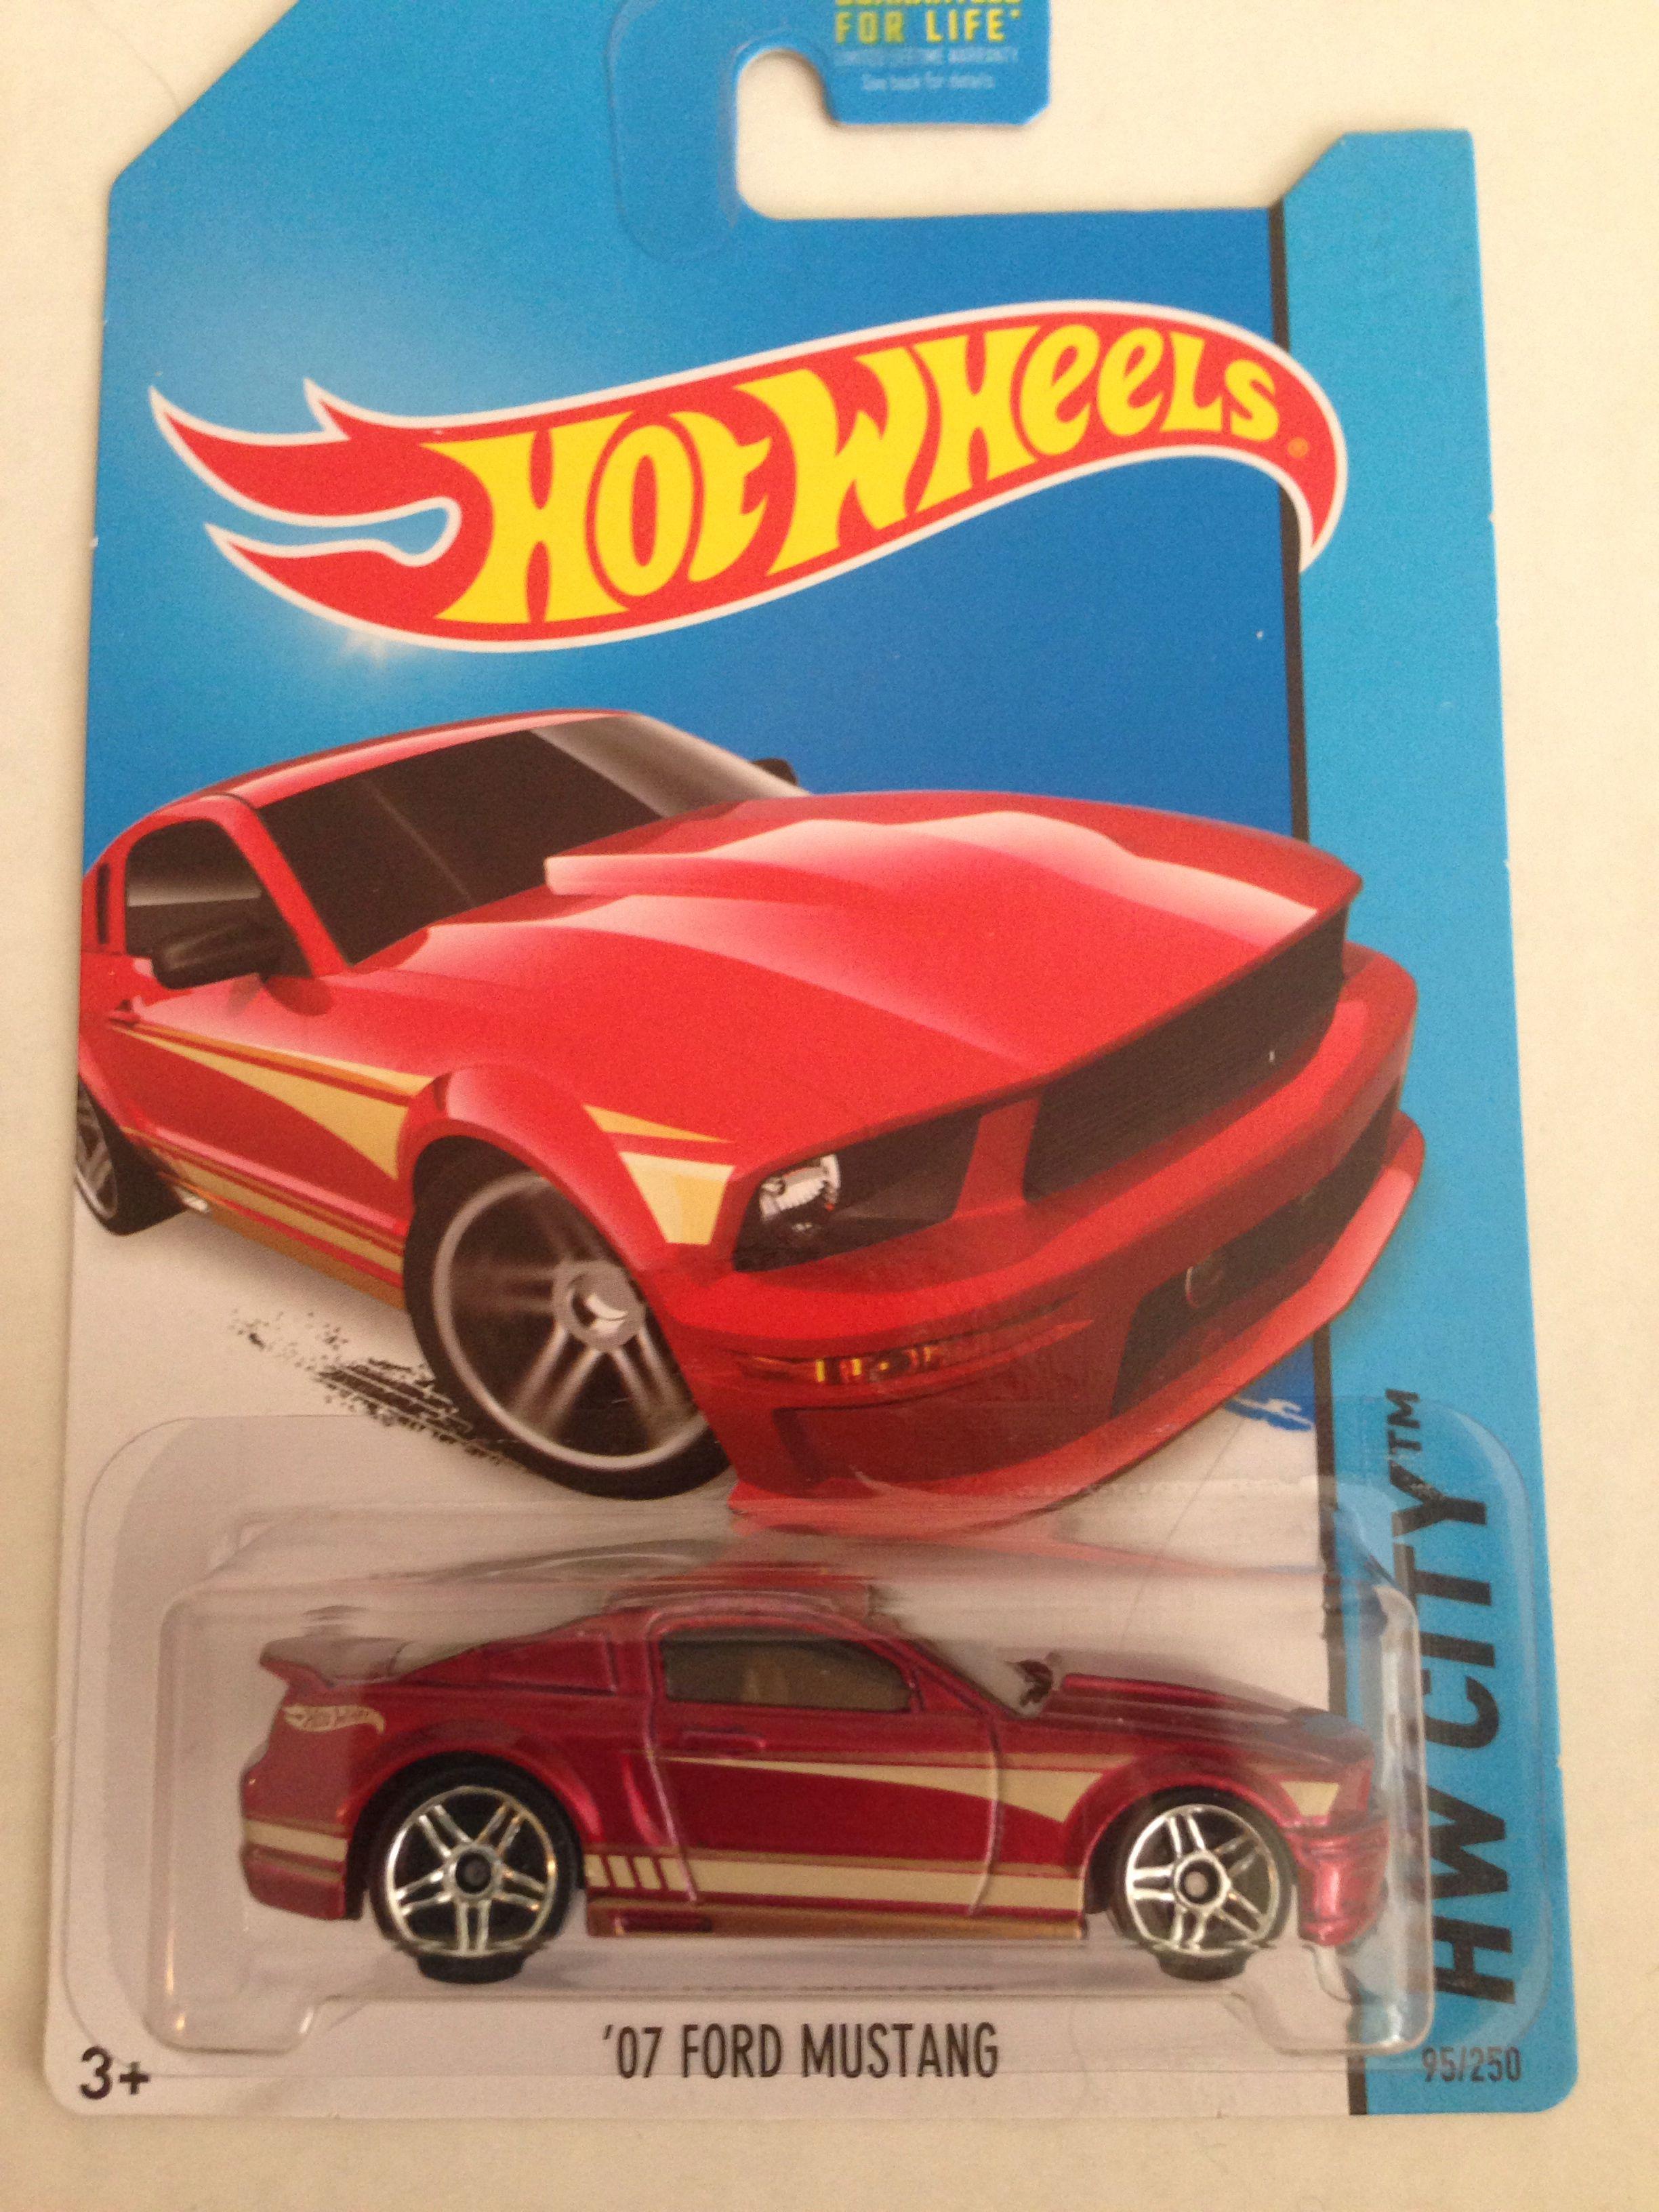 07 Ford Mustang Hot Wheels 2014 Hw City 95 250 Hot Wheels